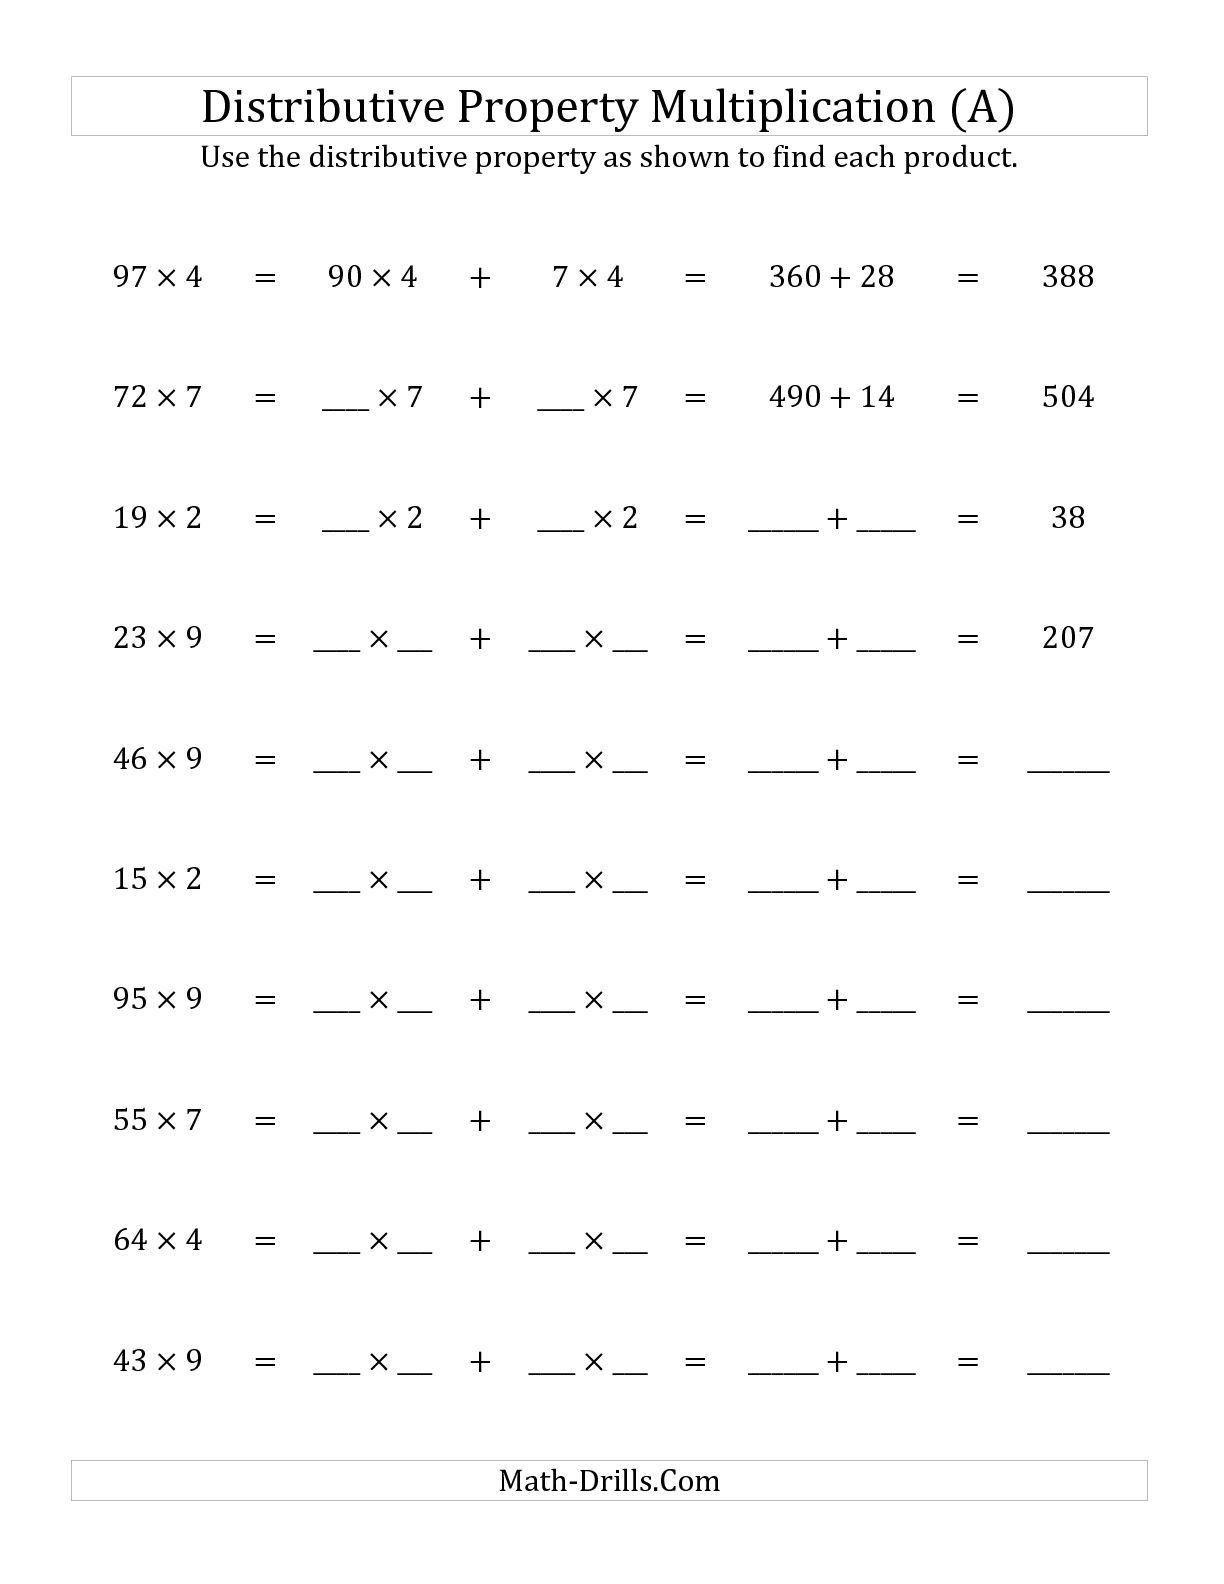 Distributive Property Worksheet 6th Grade In 2020 Multiplication Worksheets Distributive Property Distributive Property Of Multiplication